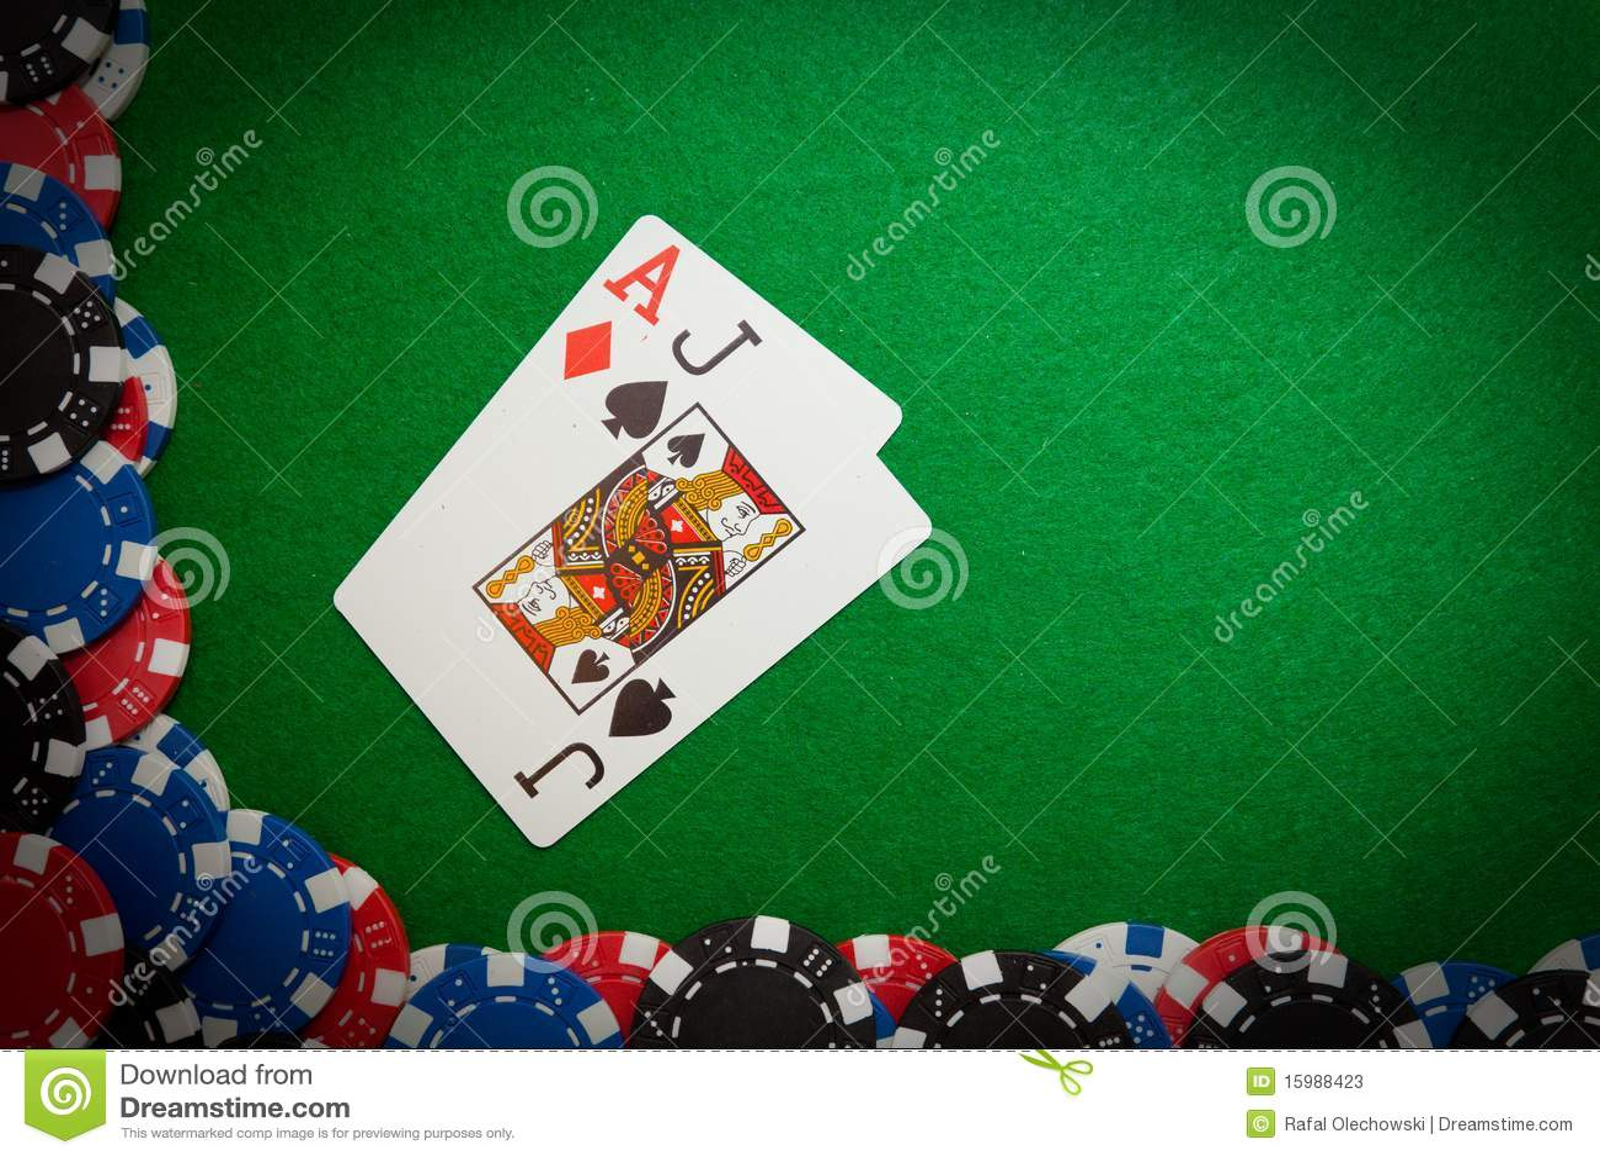 Odds of winning 9 blackjack hands in a row